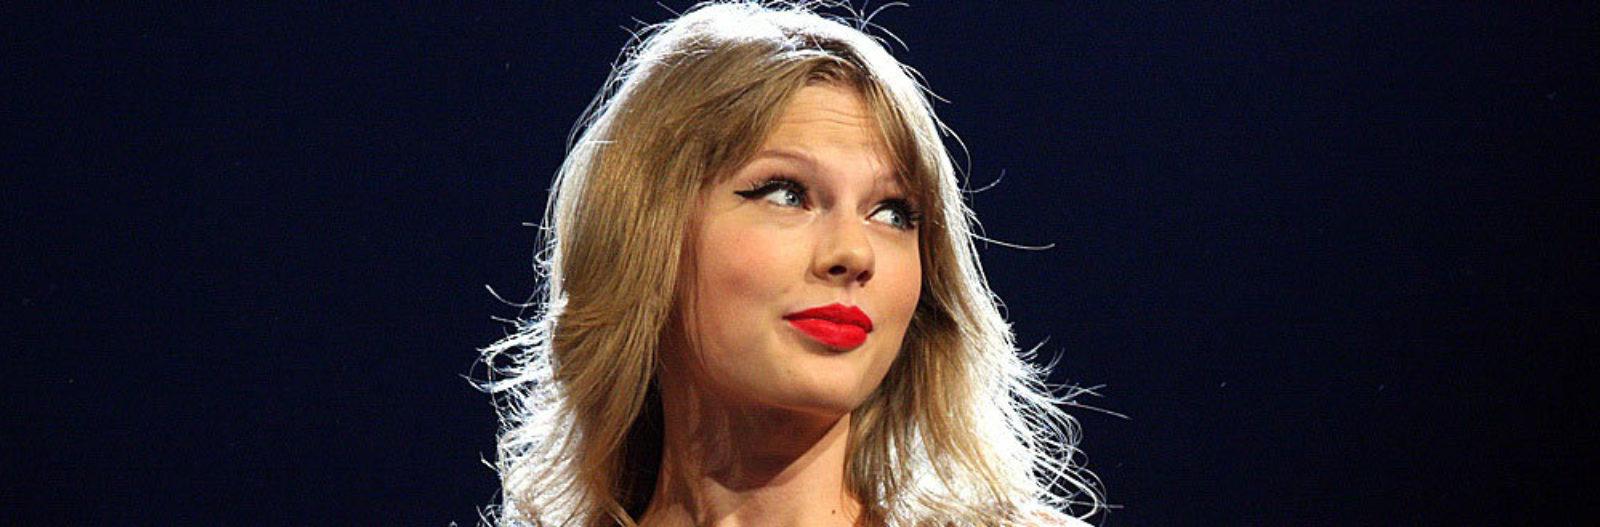 Taylor Swift Blog